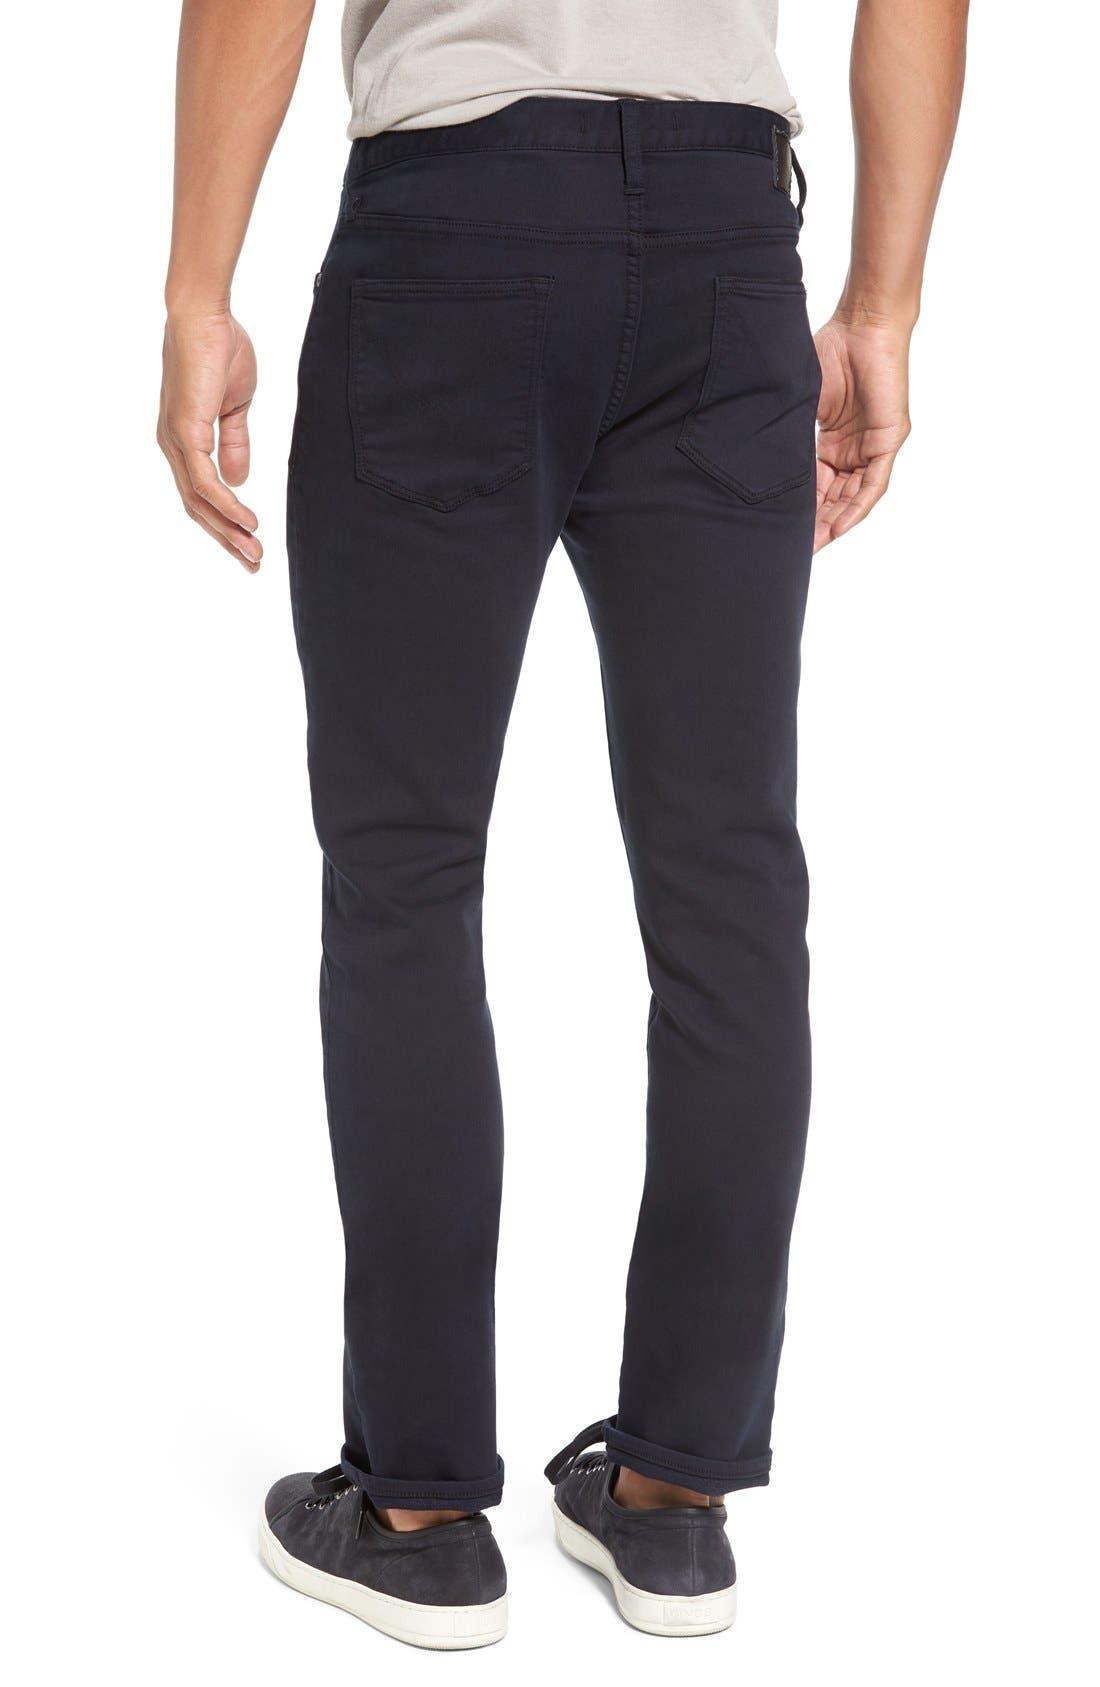 'Bowery' Slim Fit Pants,                             Alternate thumbnail 2, color,                             Eclipse